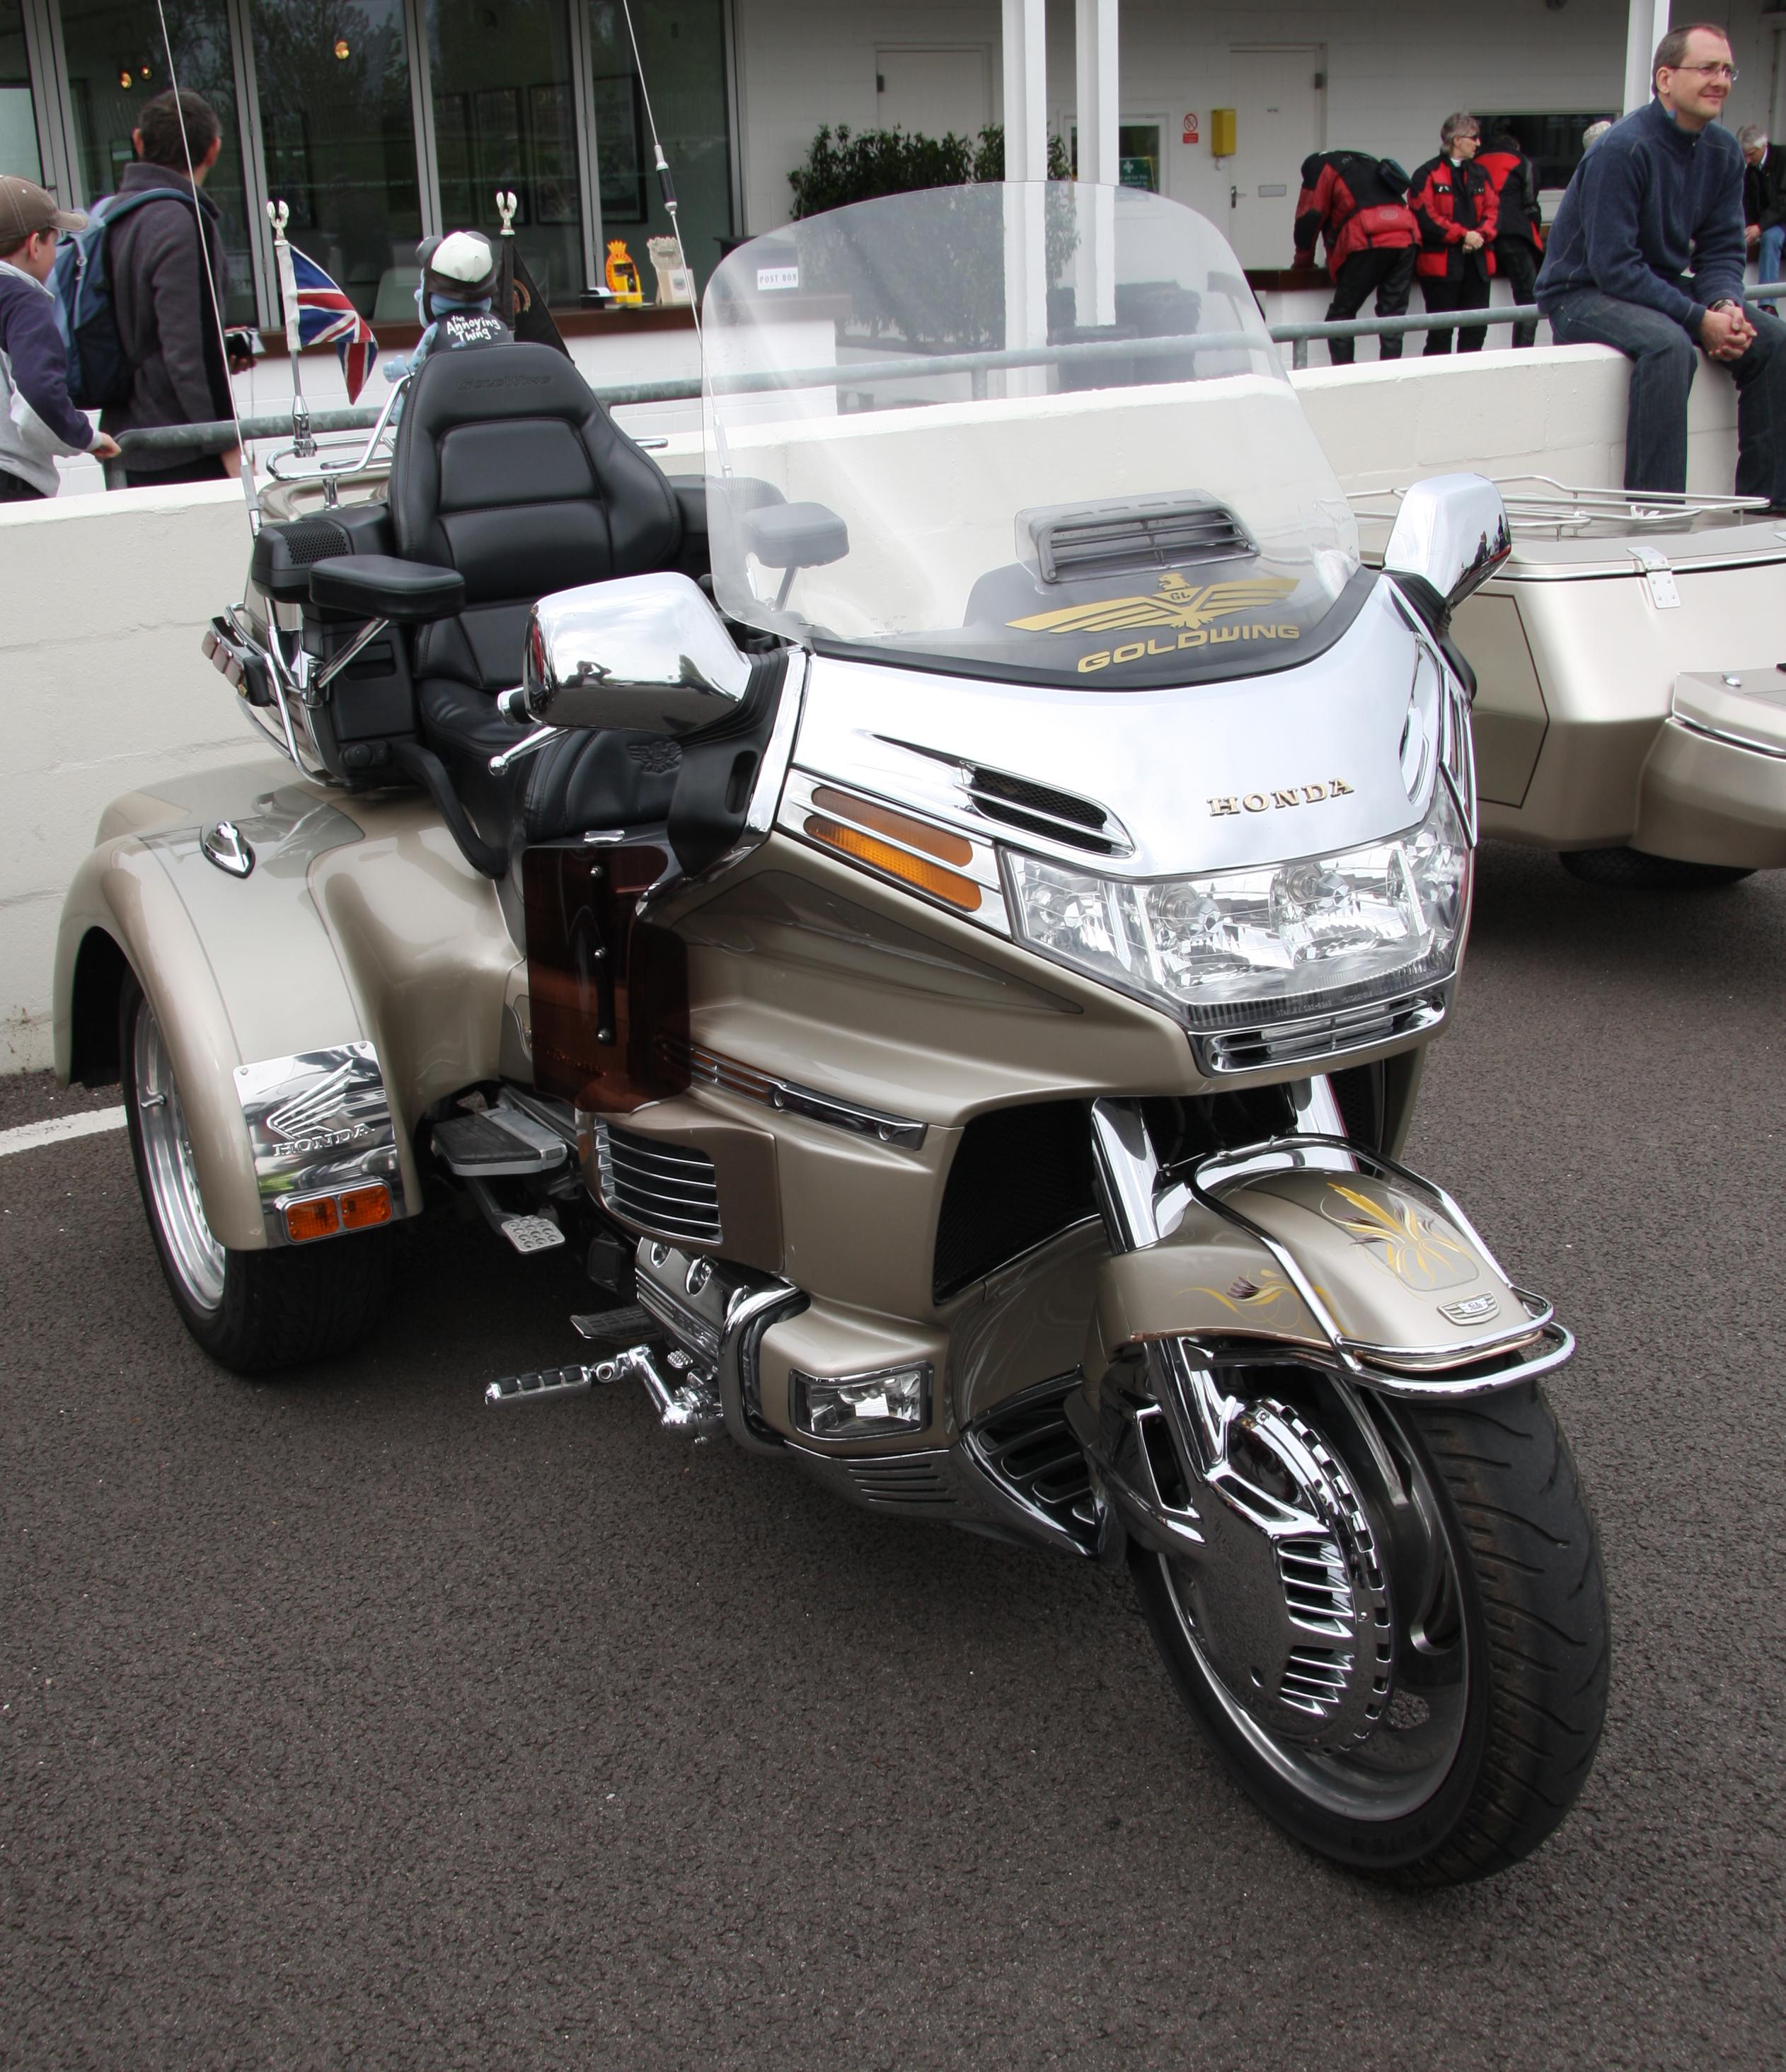 Honda Goldwing Motorcycle Lithium Ion Battery